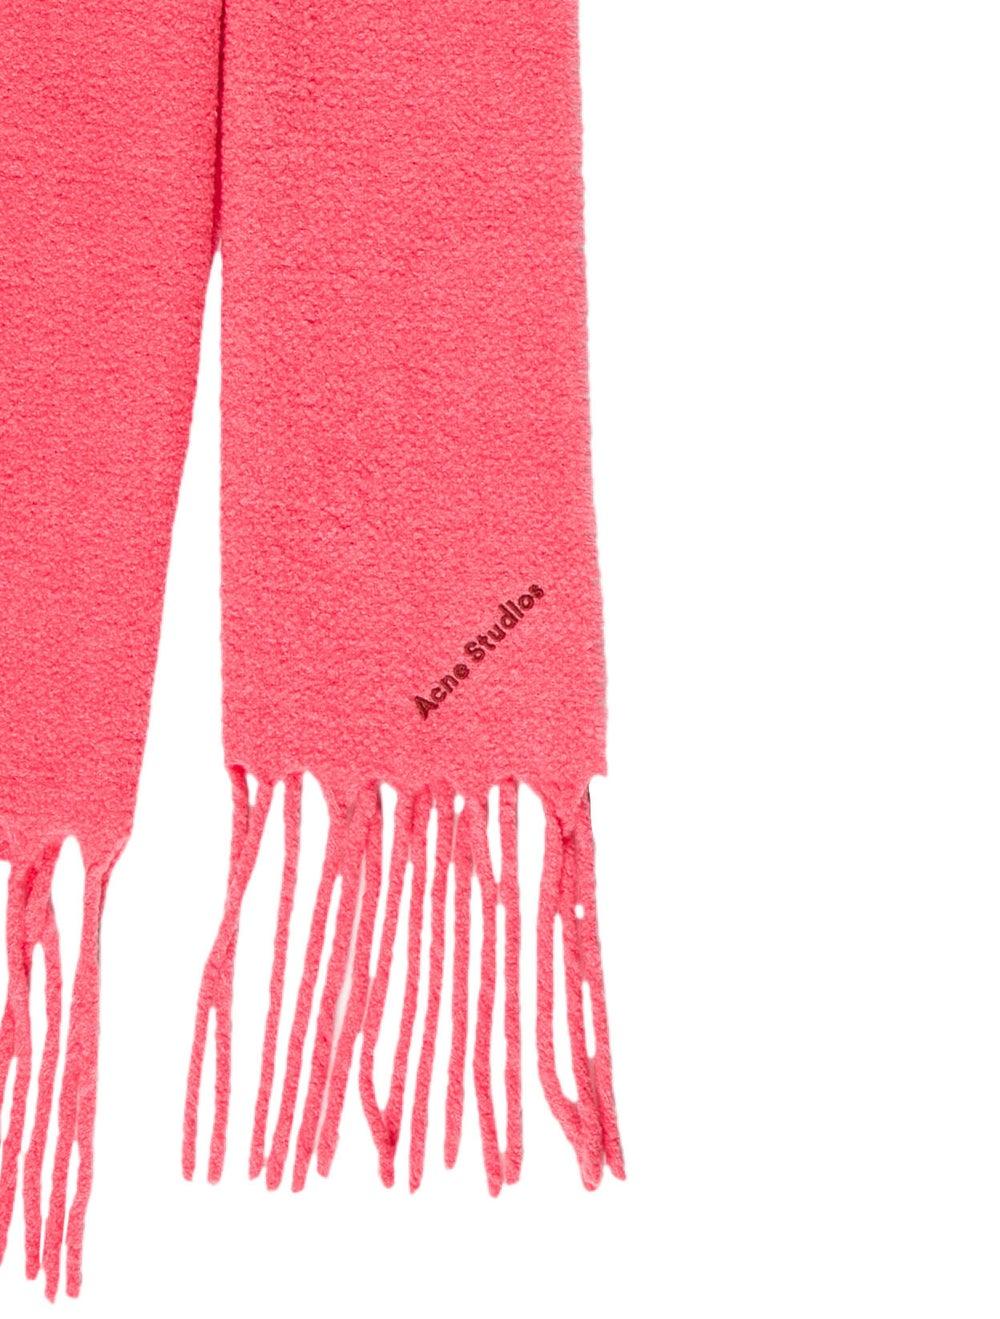 Acne Studios Villy Knit Scarf Pink - image 2